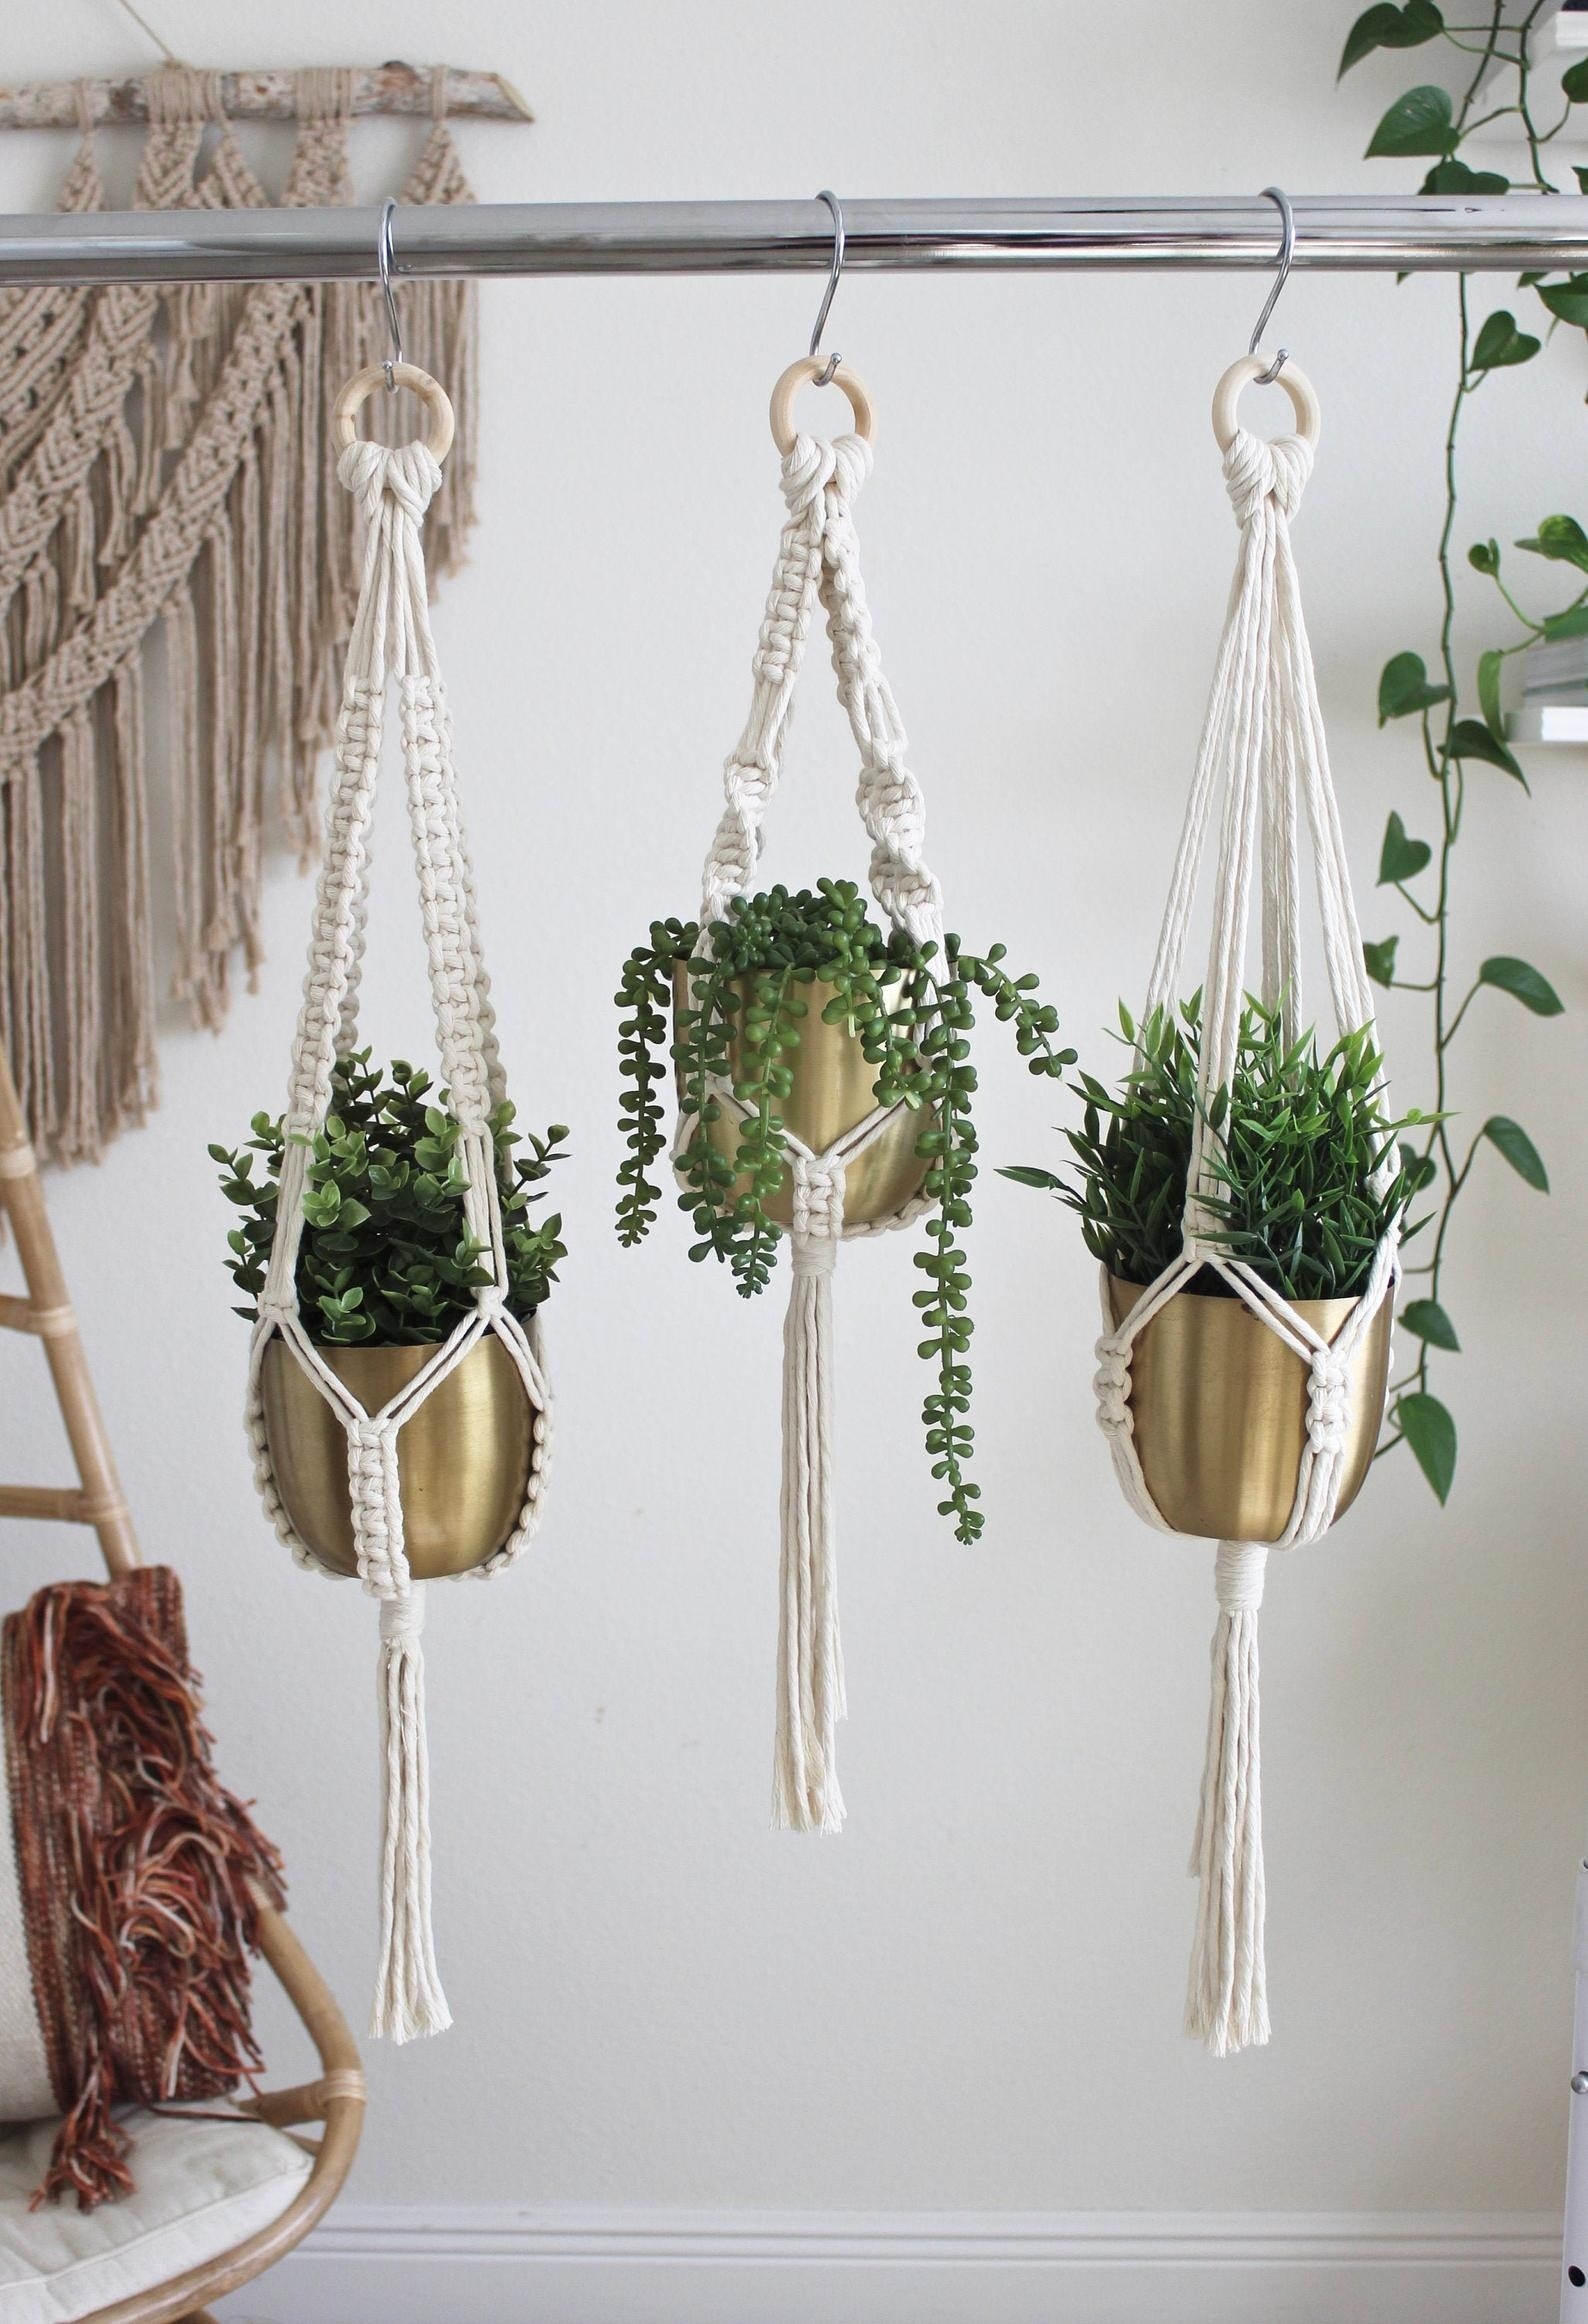 The Macrame Plant Hanger